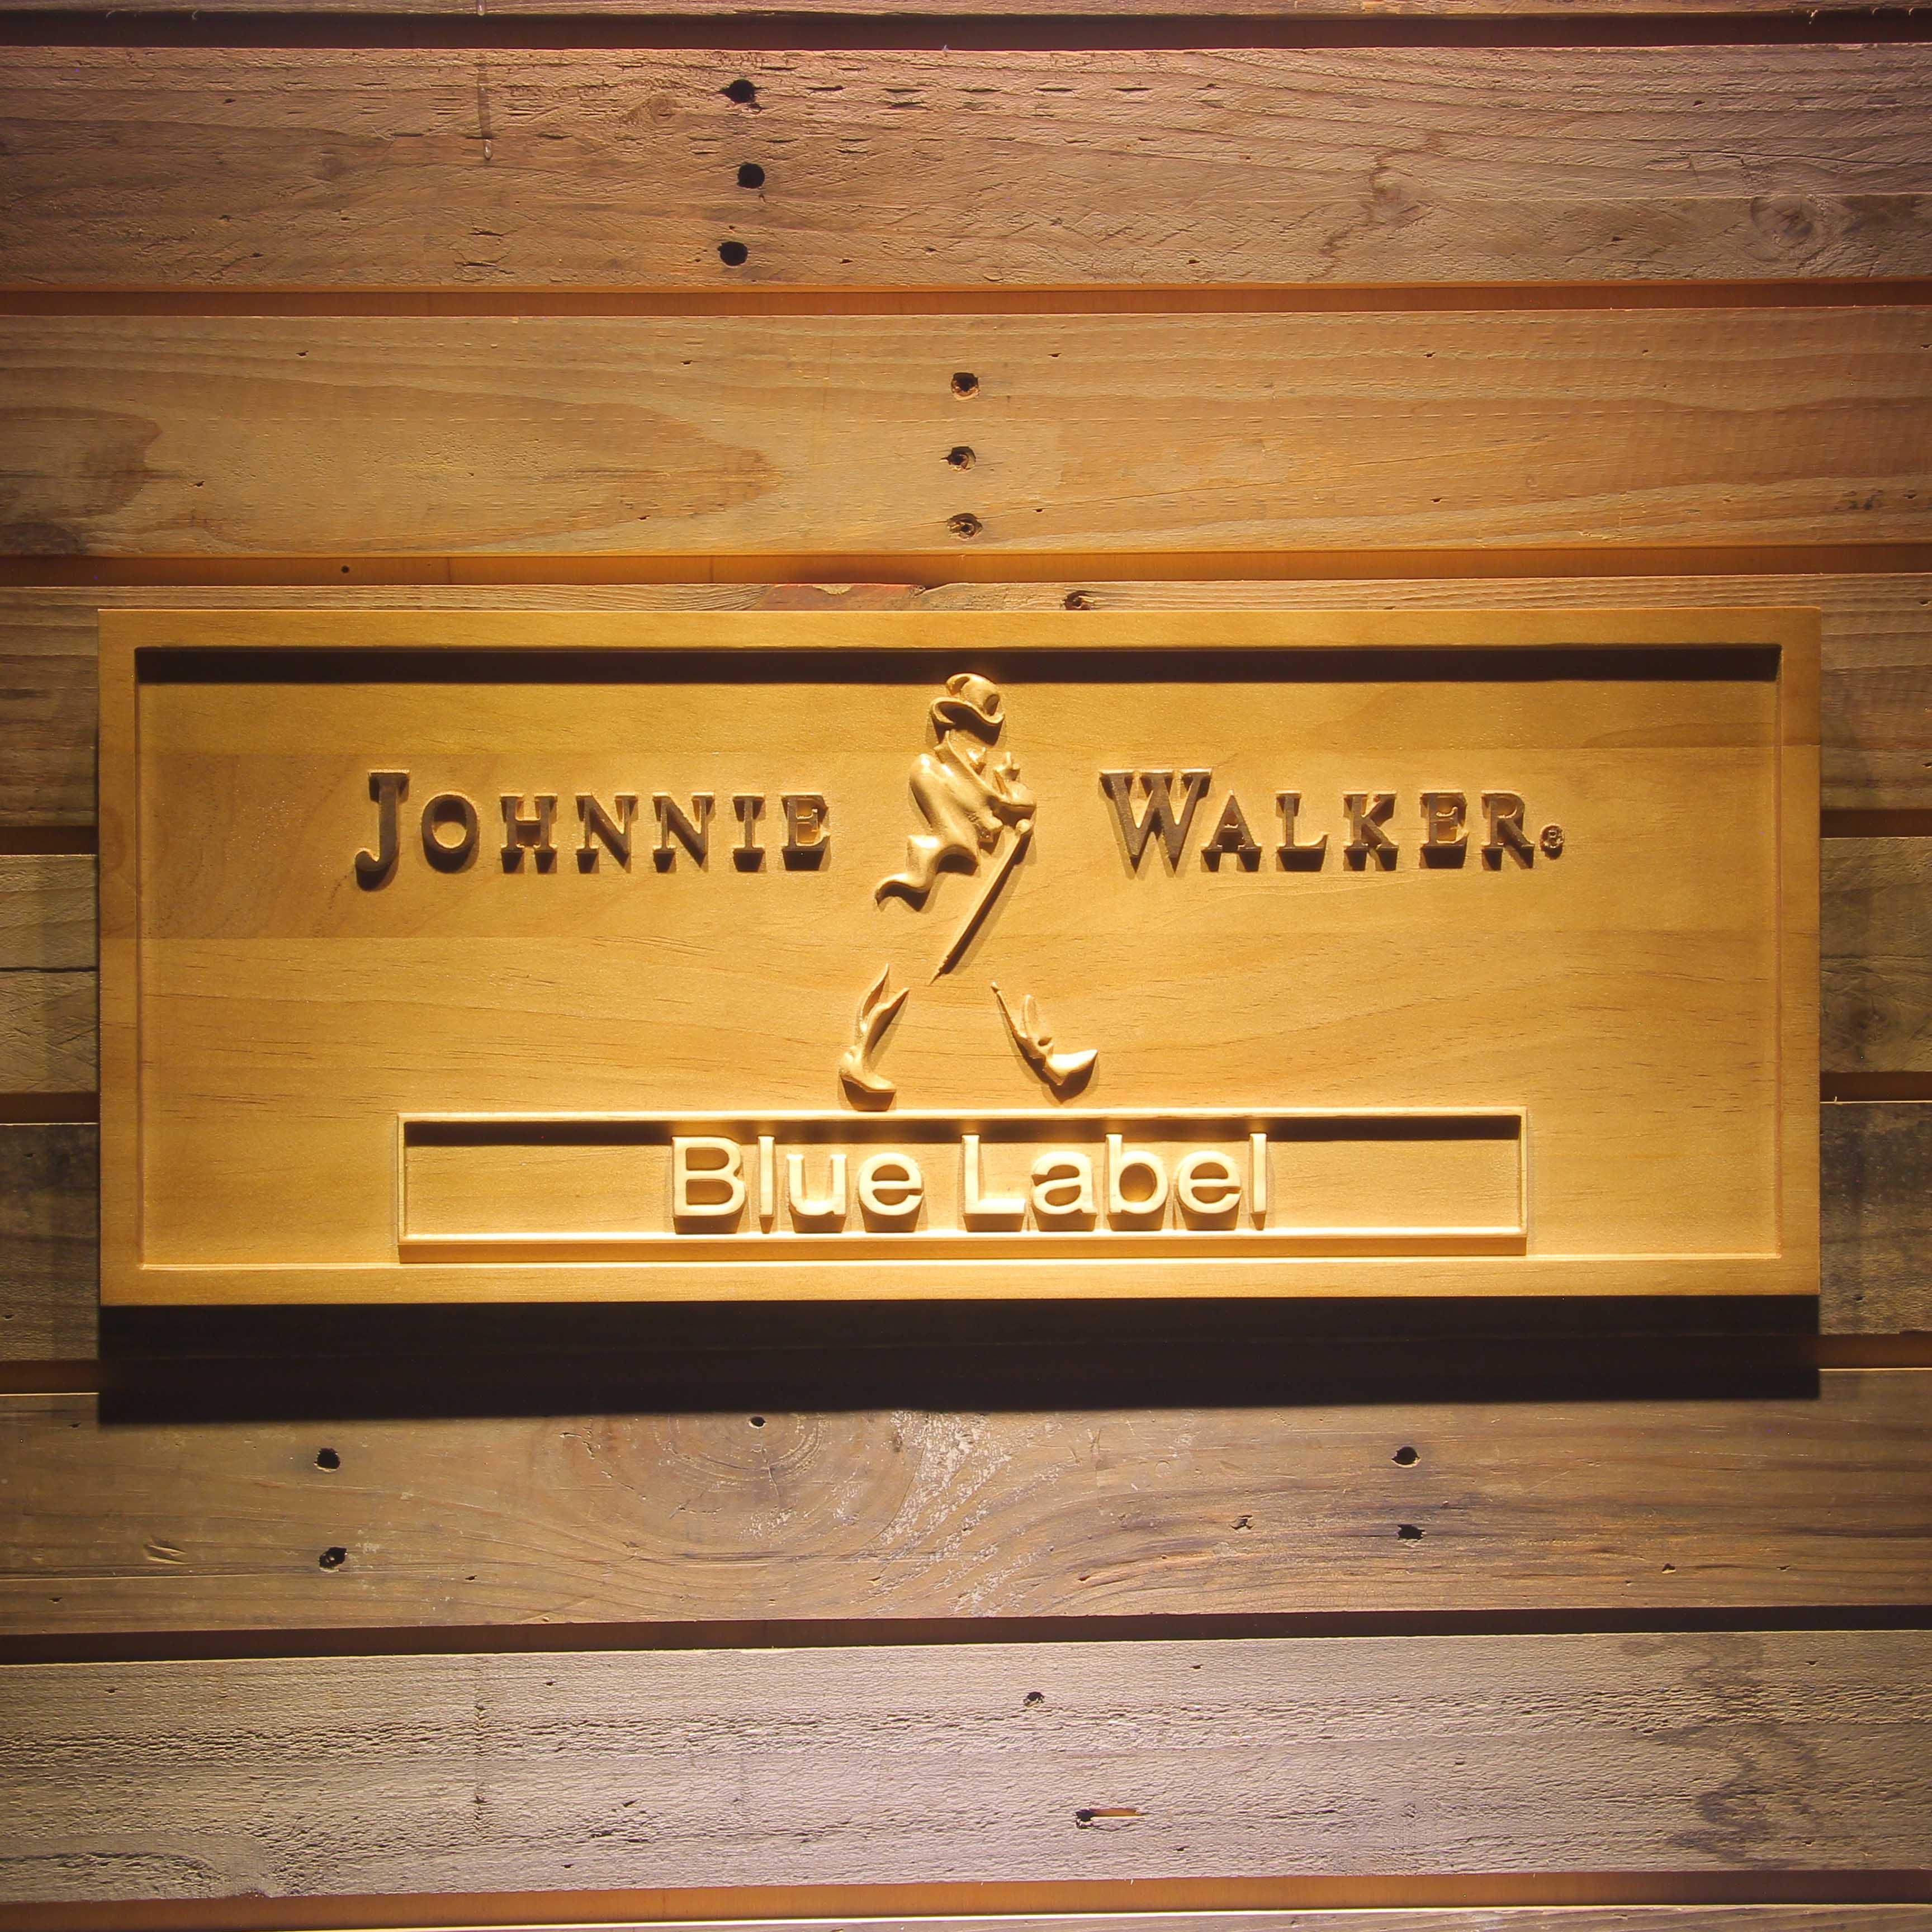 Johnnie Walker Blue Label Bar 3D Wooden Signs